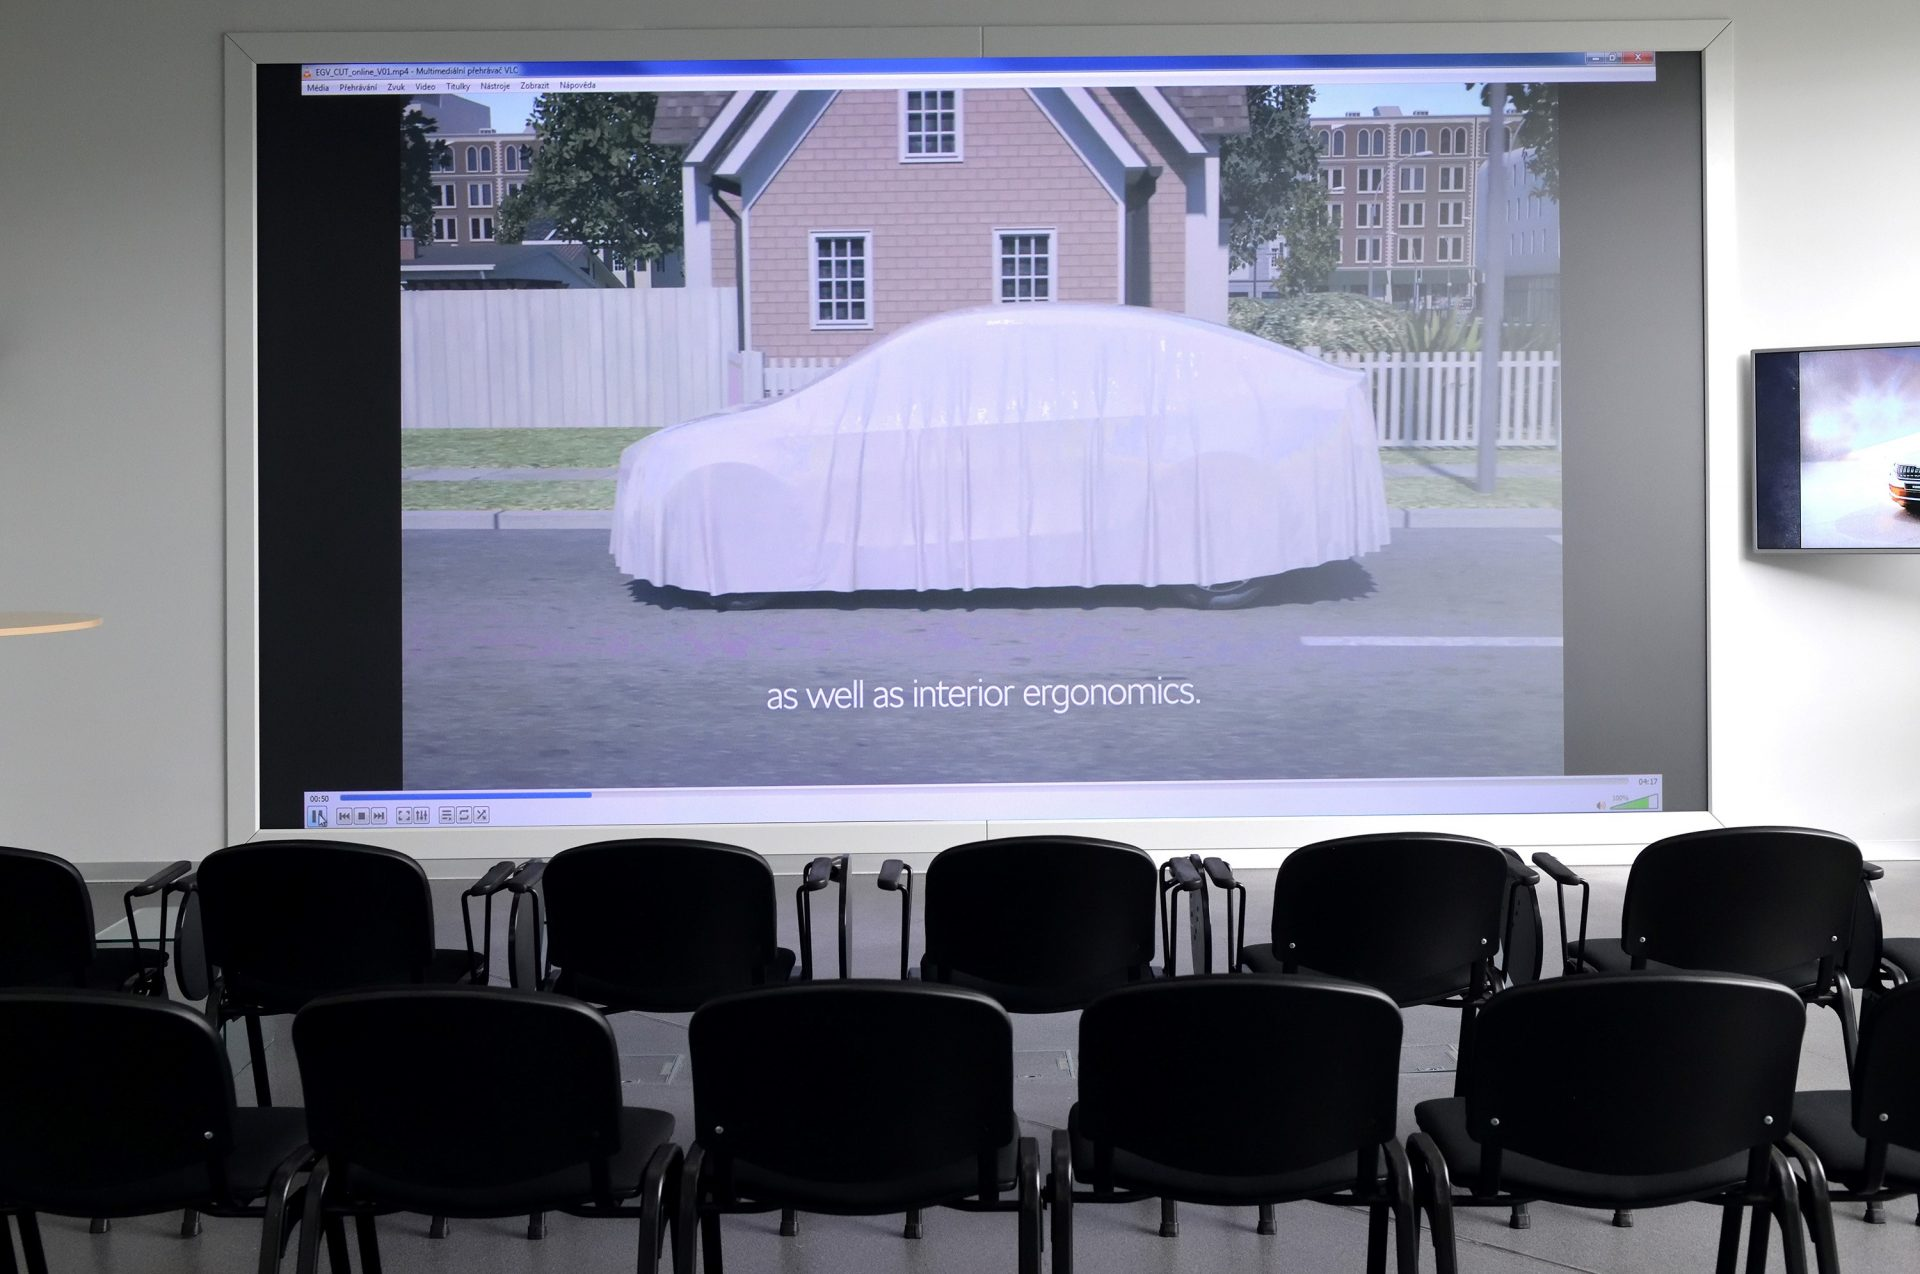 egv-projector-test-skoda-company-office-1920x1274